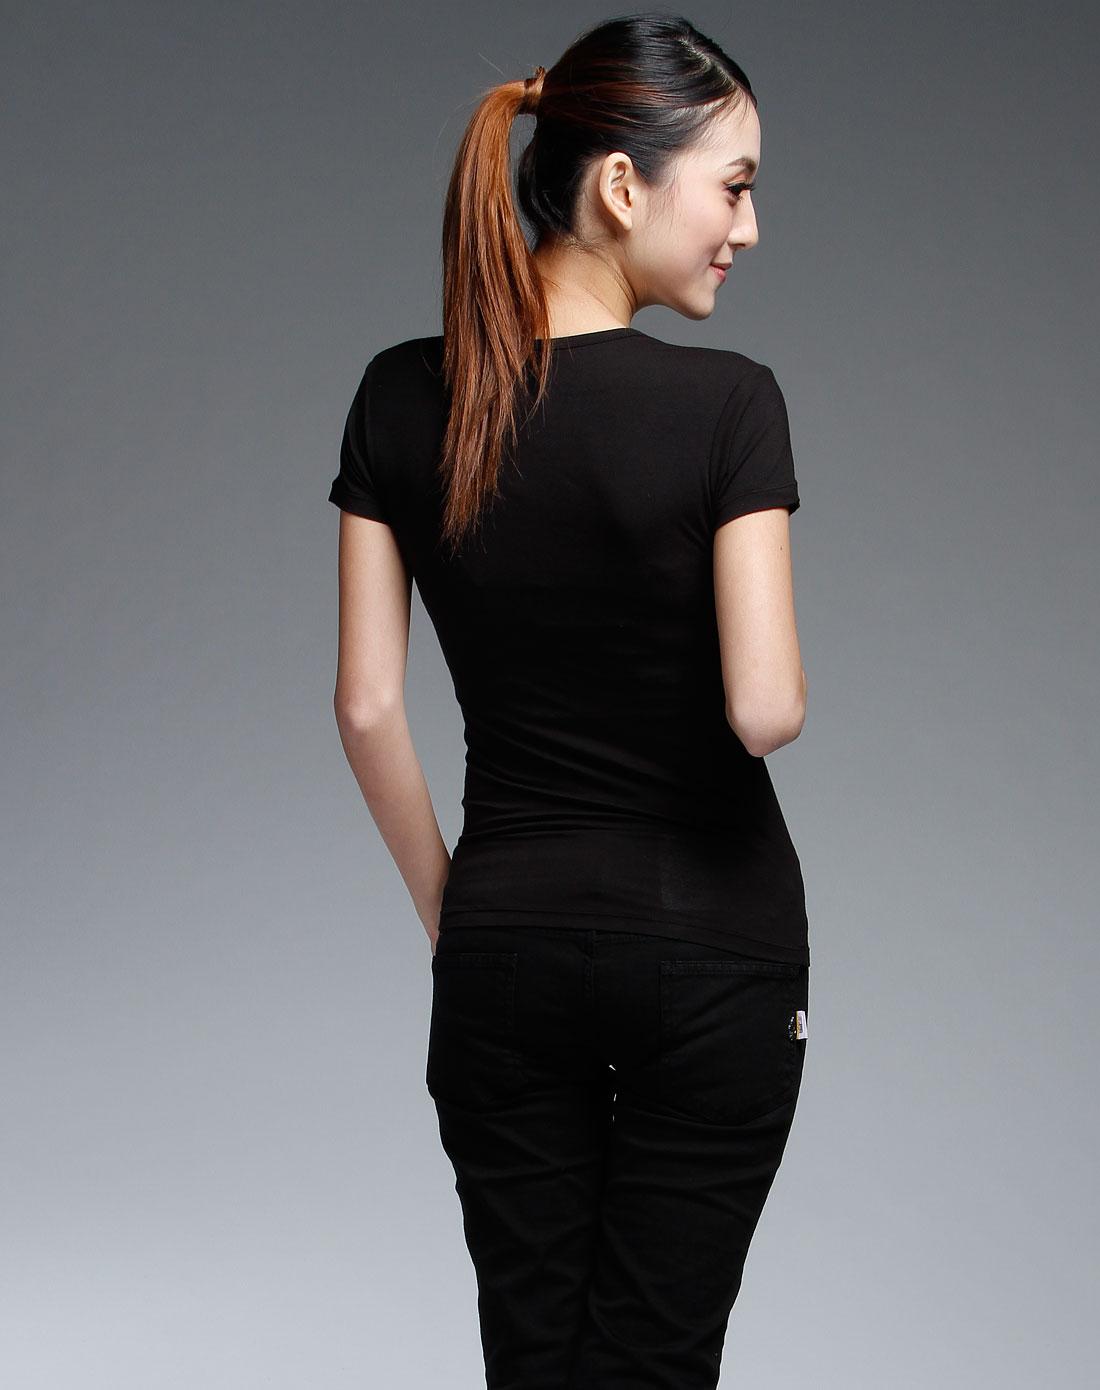 jockey黑色短袖内衣